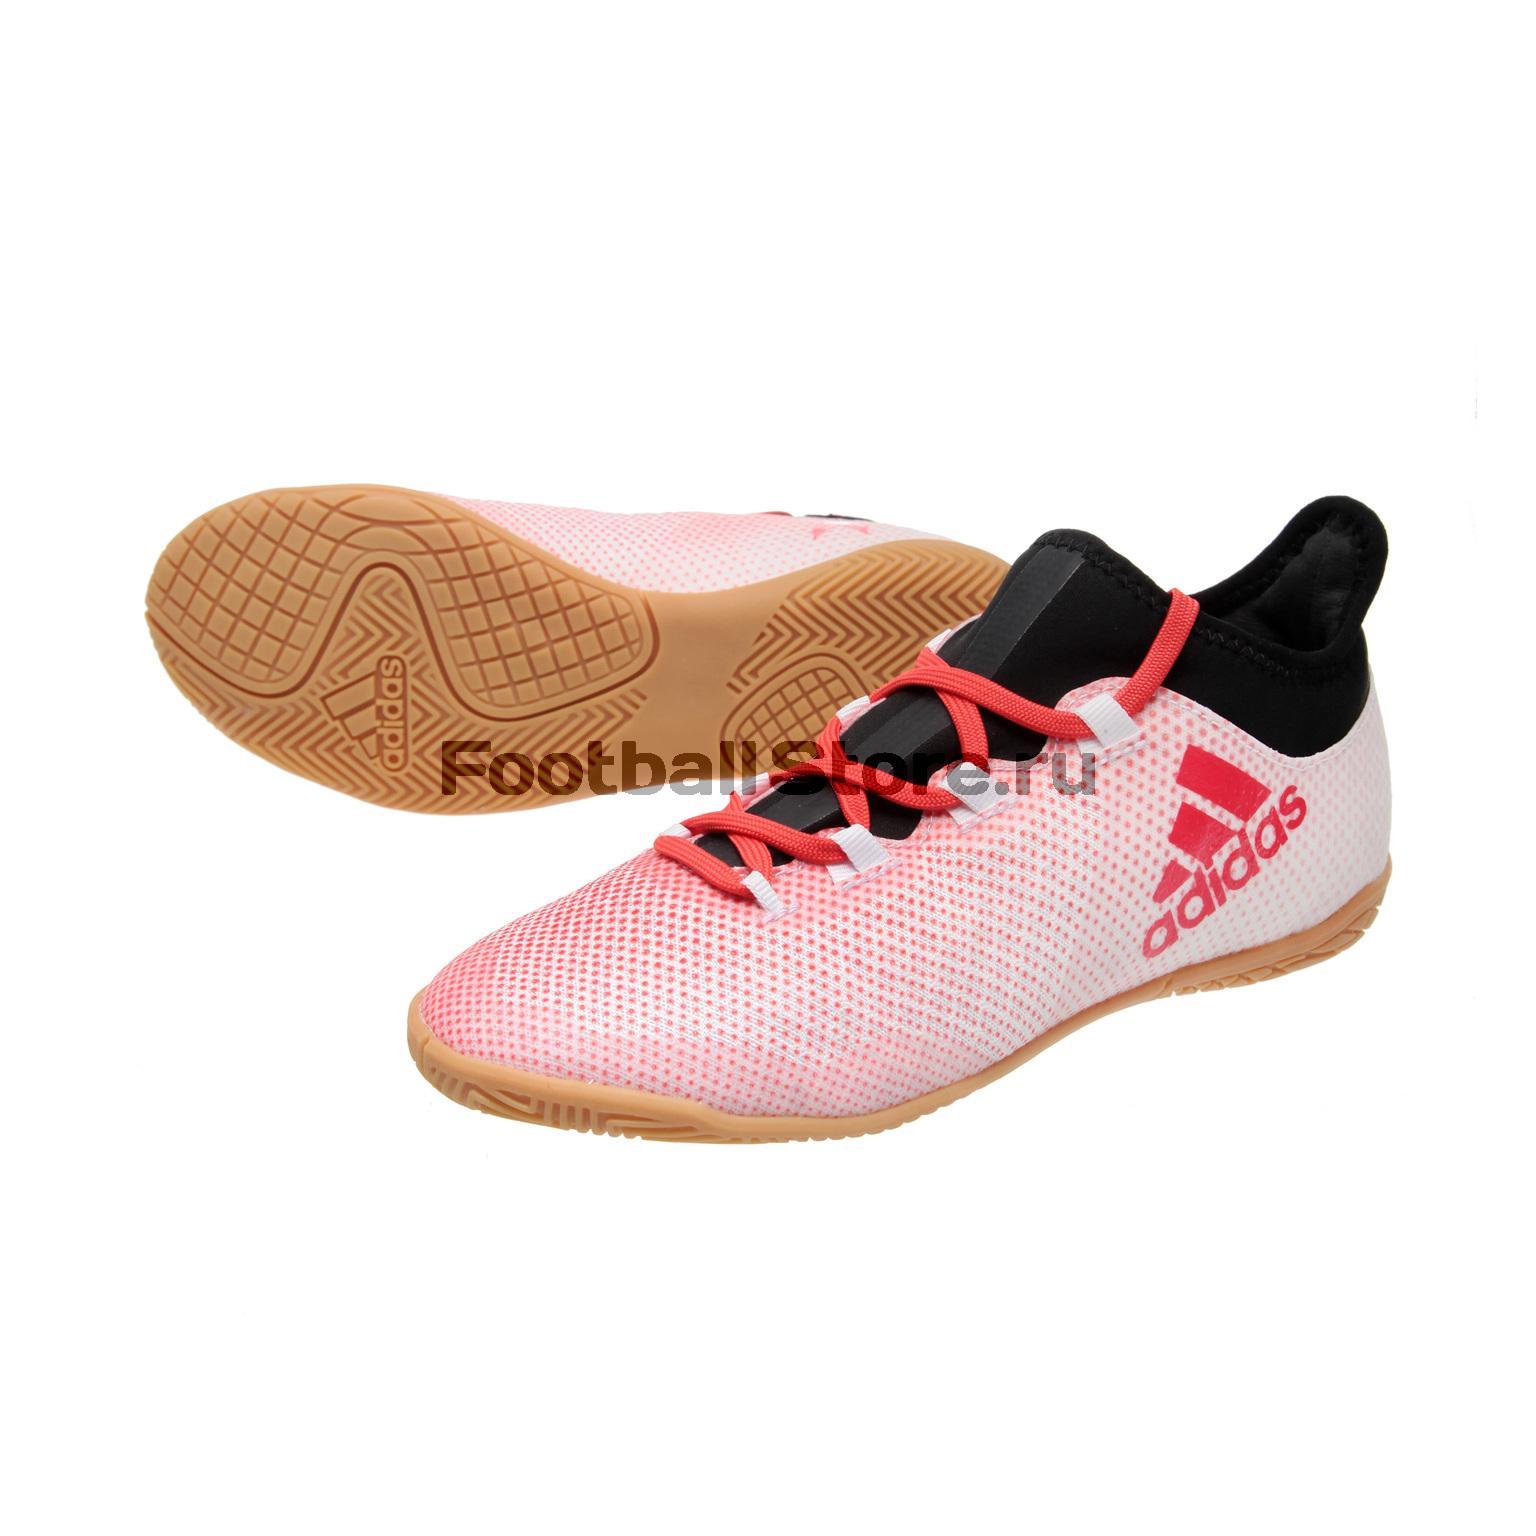 fa60506e12bdf7 Футзалки детские Adidas X Tango 17.3 IN CP9034 – купить в интернет ...